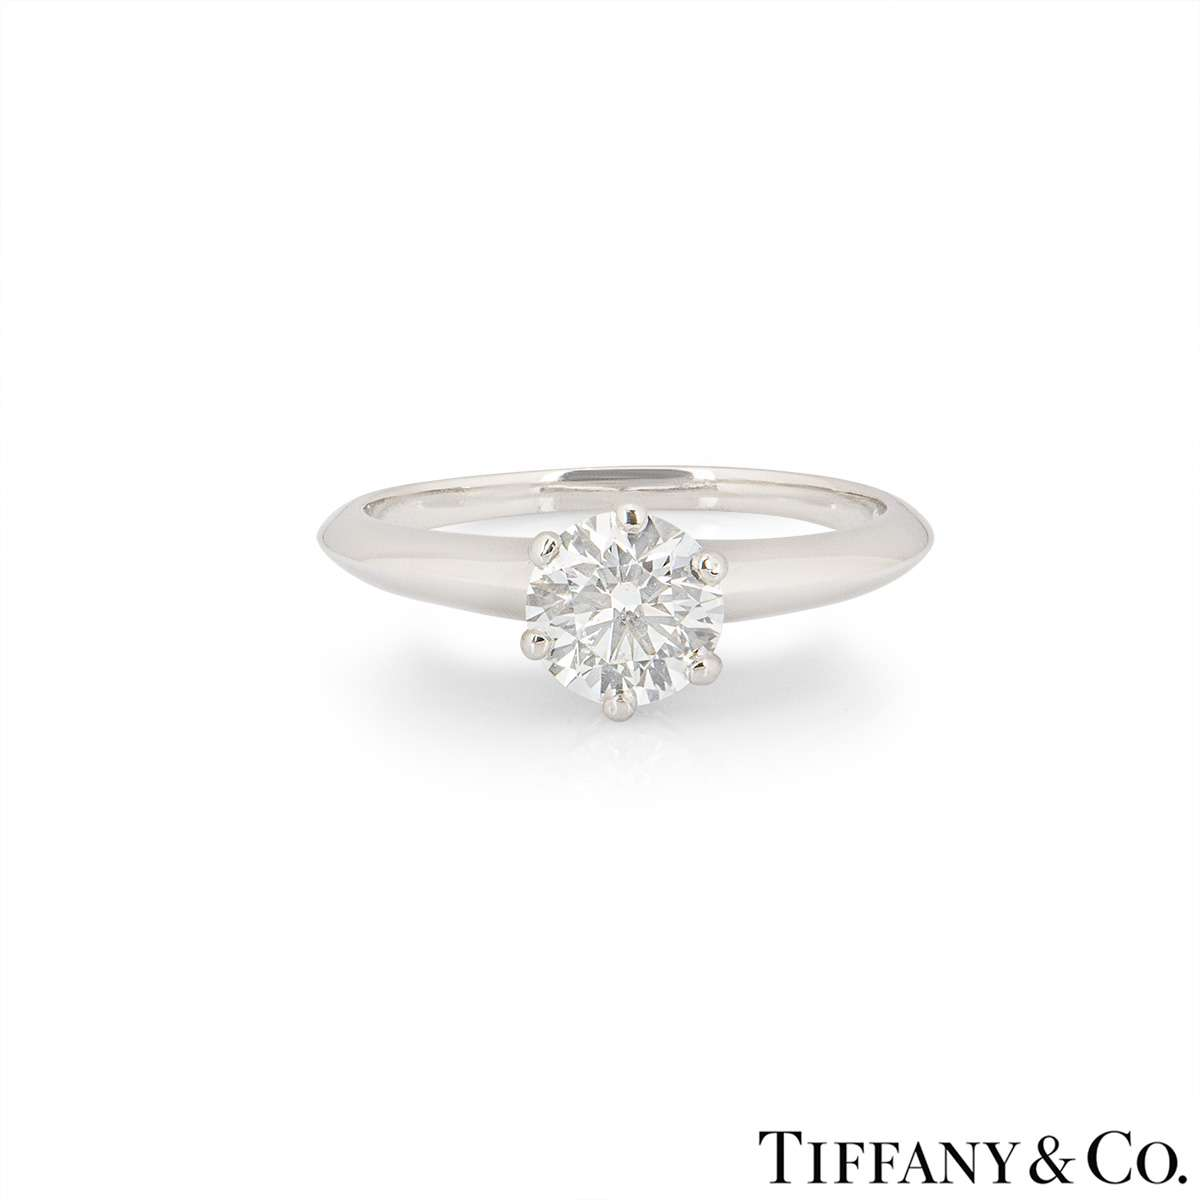 Tiffany & Co. Round Brilliant Cut Diamond Ring 1.05ct G/VS1